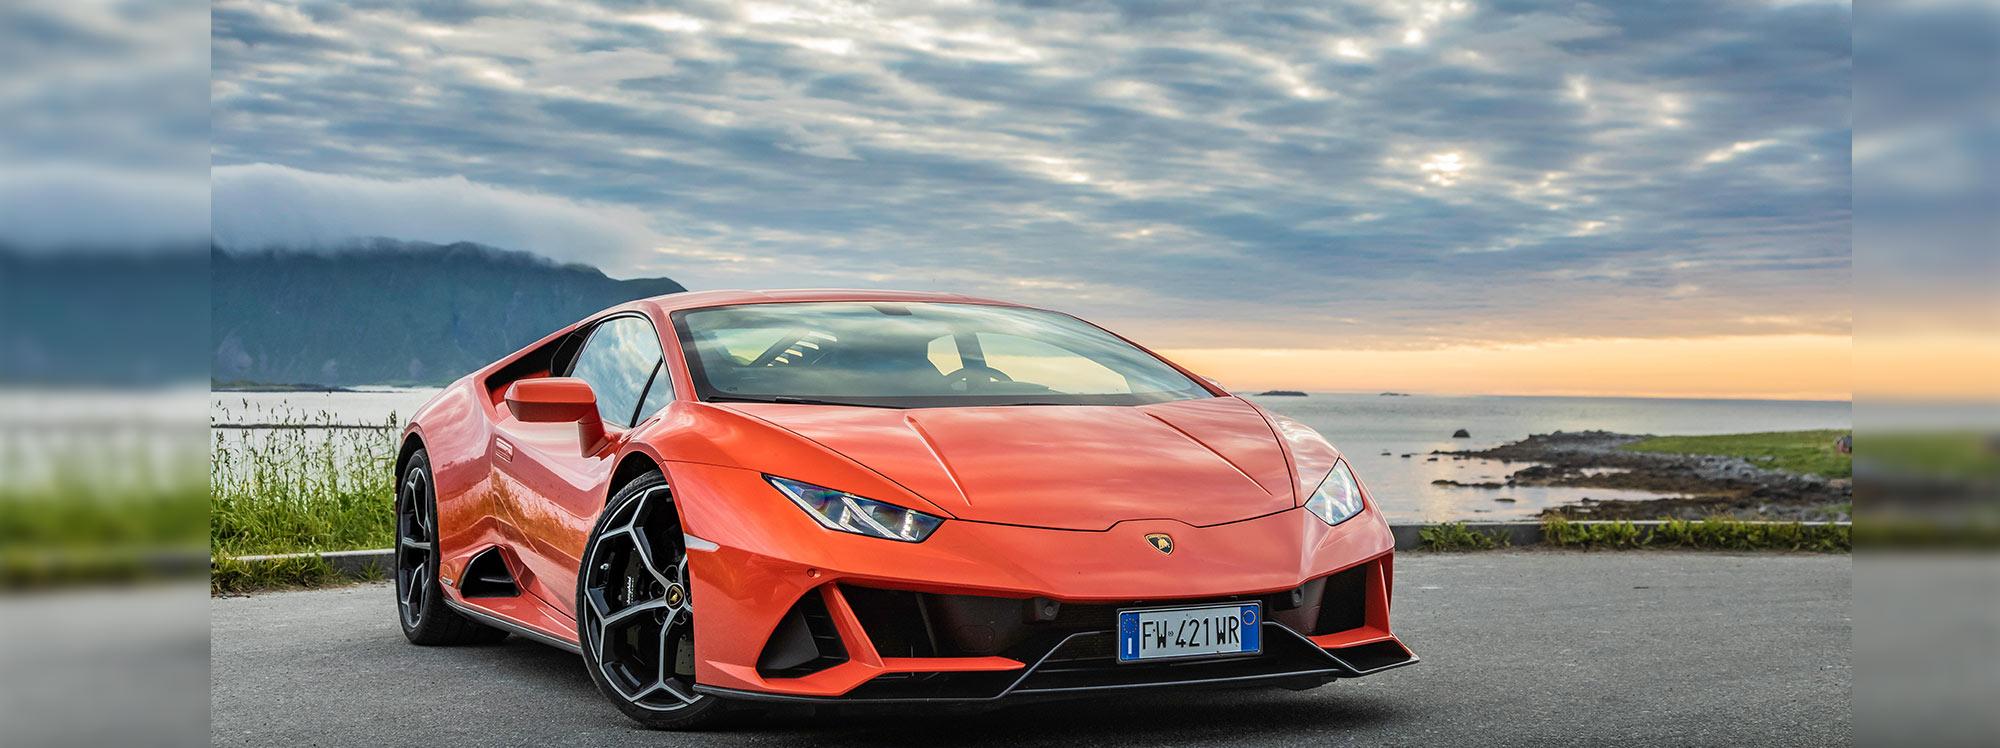 Lamborghini, el primero en incorporar control integral de Amazon Alexa